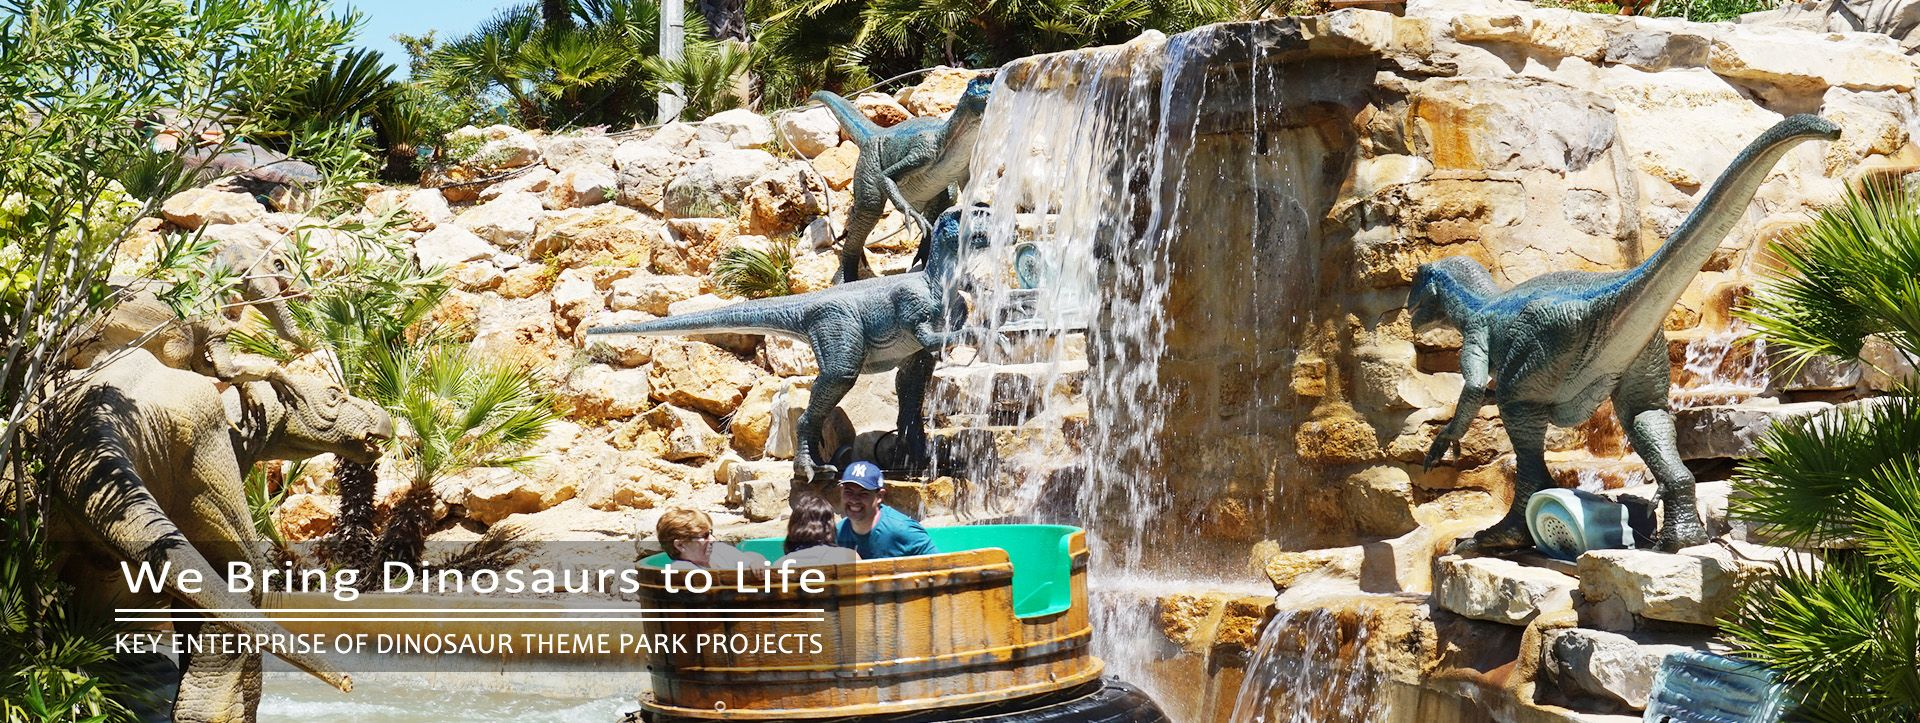 outdoor life size animatronic dinosaur